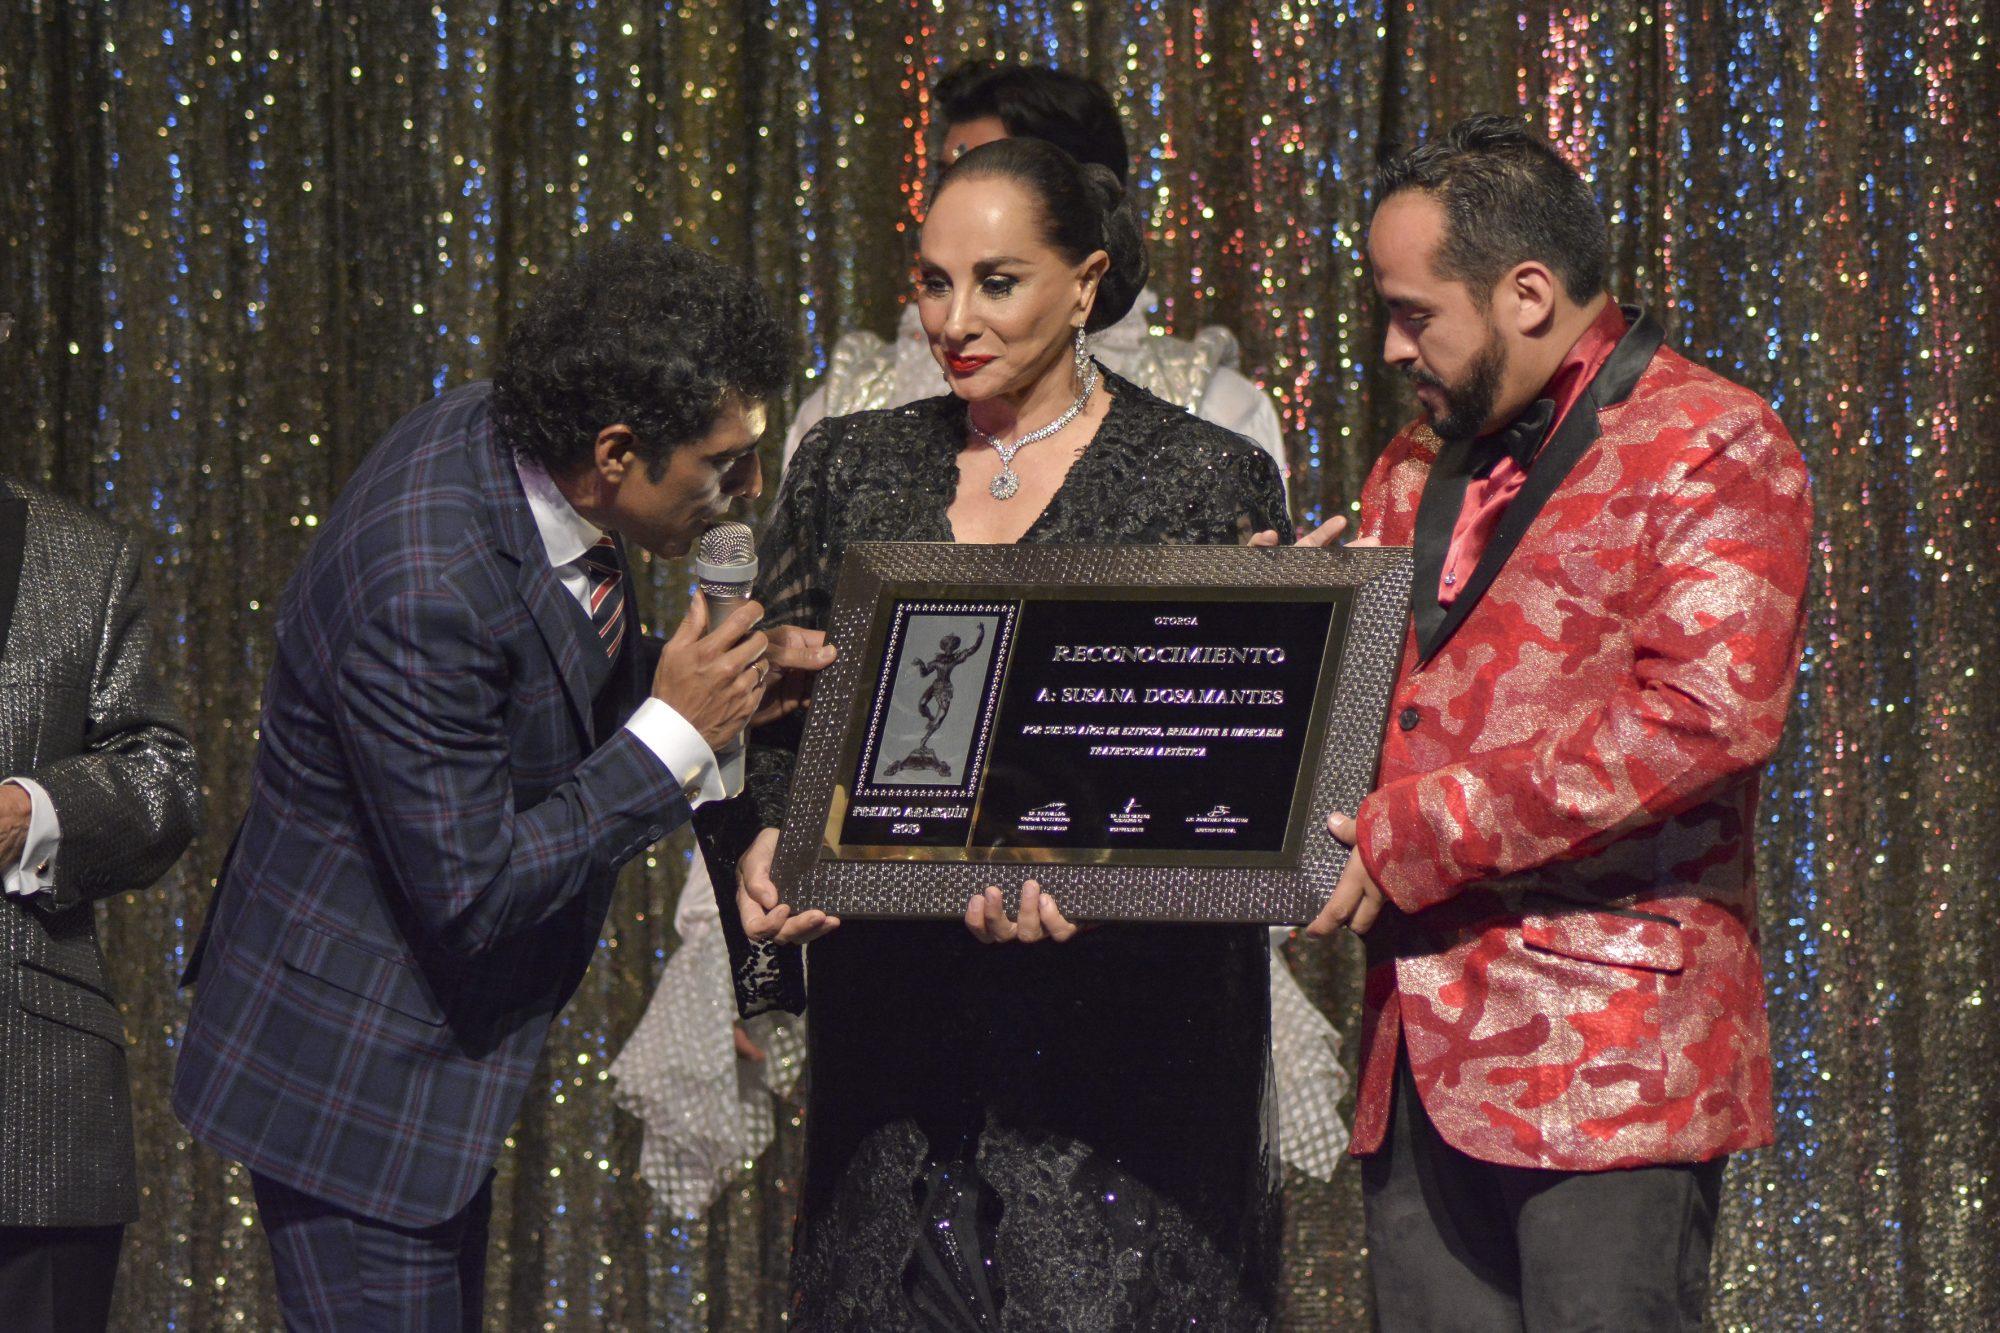 Susana Dosamantes, Premios Arlequín